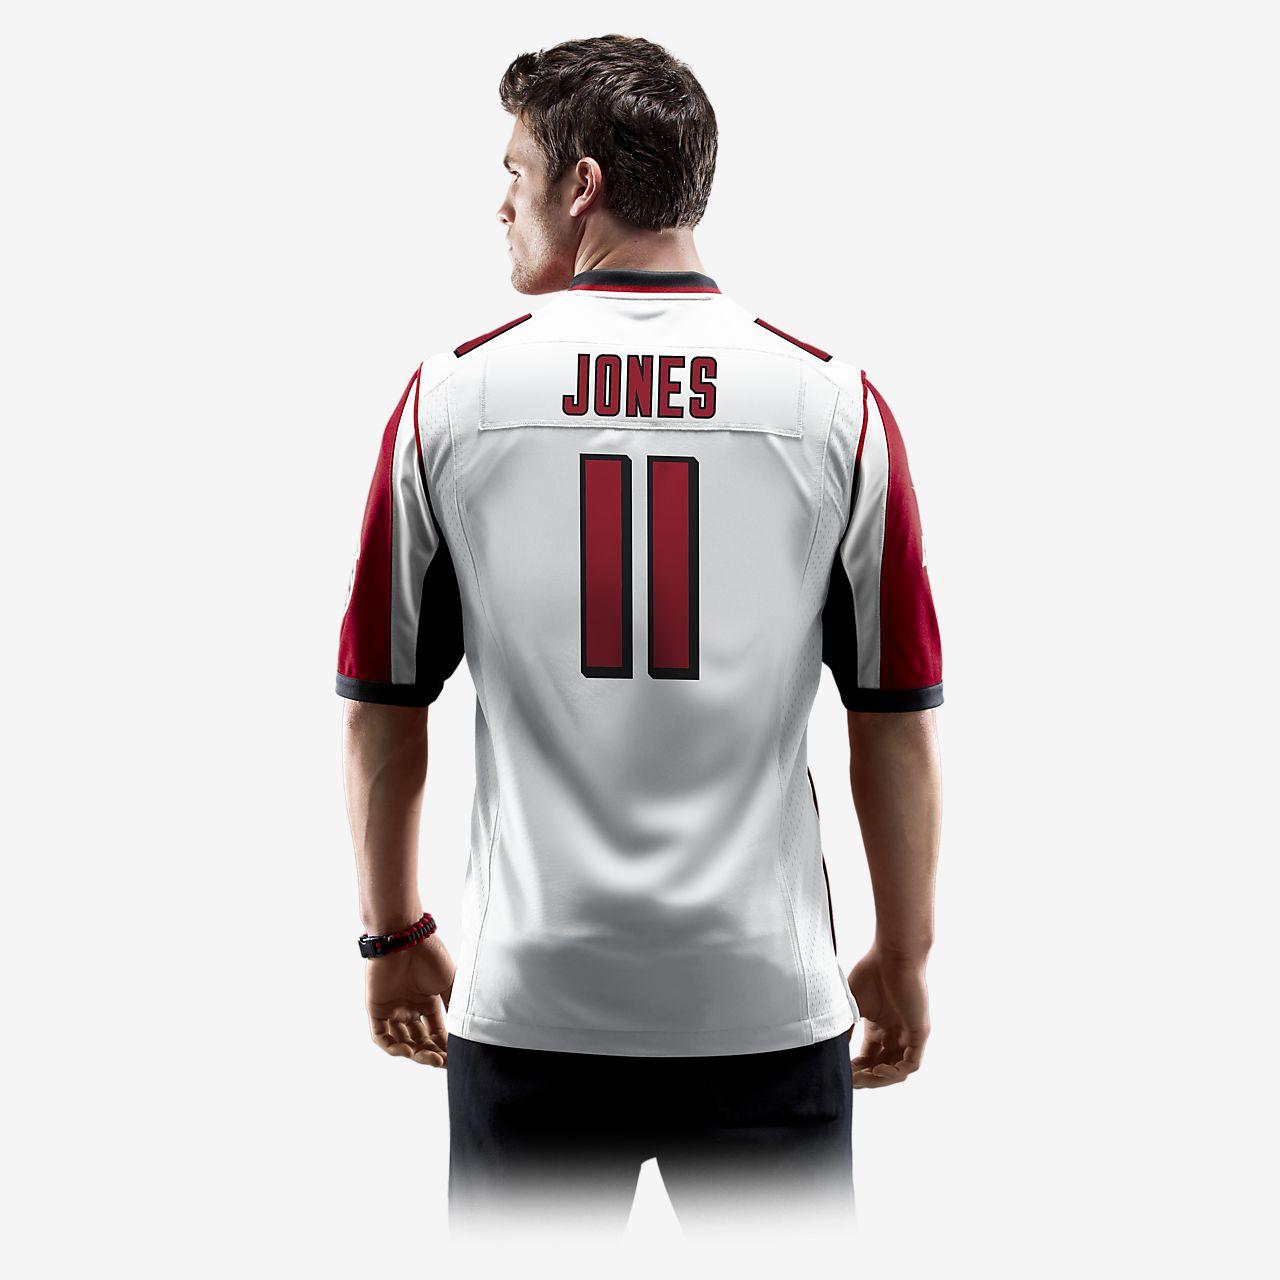 2ad47b69b27 NFL Atlanta Falcons (Julio Jones) Men s Football Away Game Jersey ...